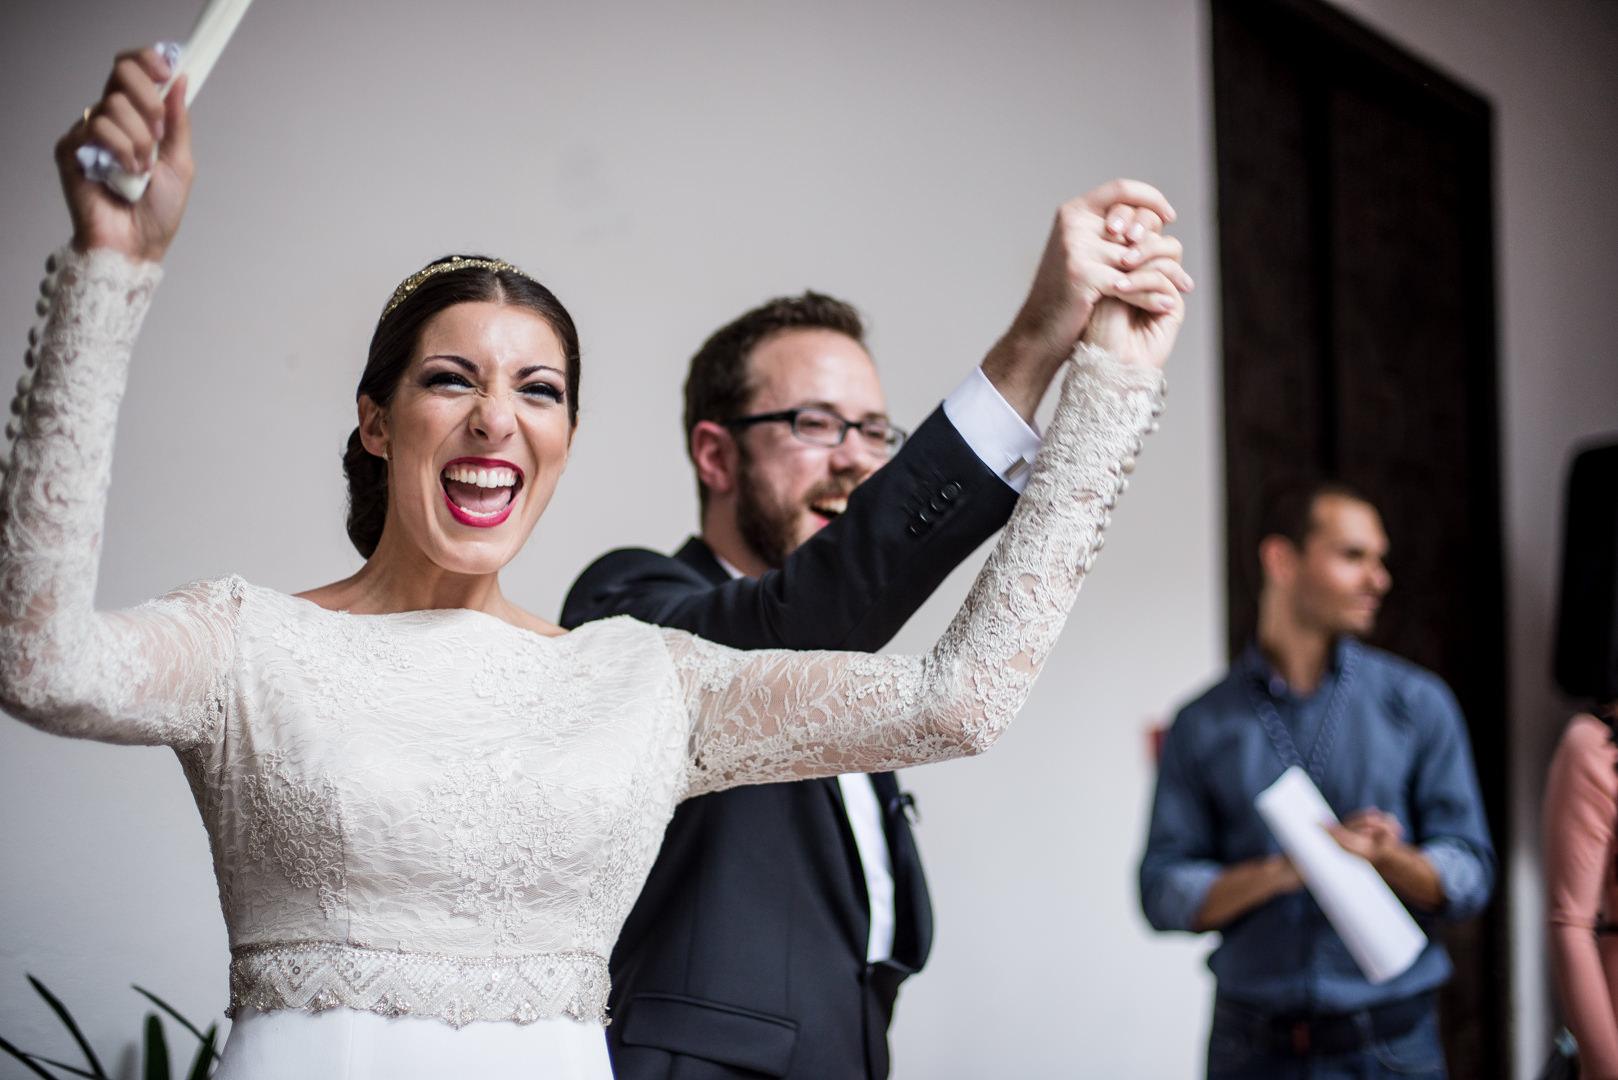 Boda-Sevilla-Museo-Carmona-Hamburgo-Maria-Carles-engagement-Rafael-Torres-fotografo-bodas-sevilla-madrid-barcelona-wedding-photographer--25.jpg